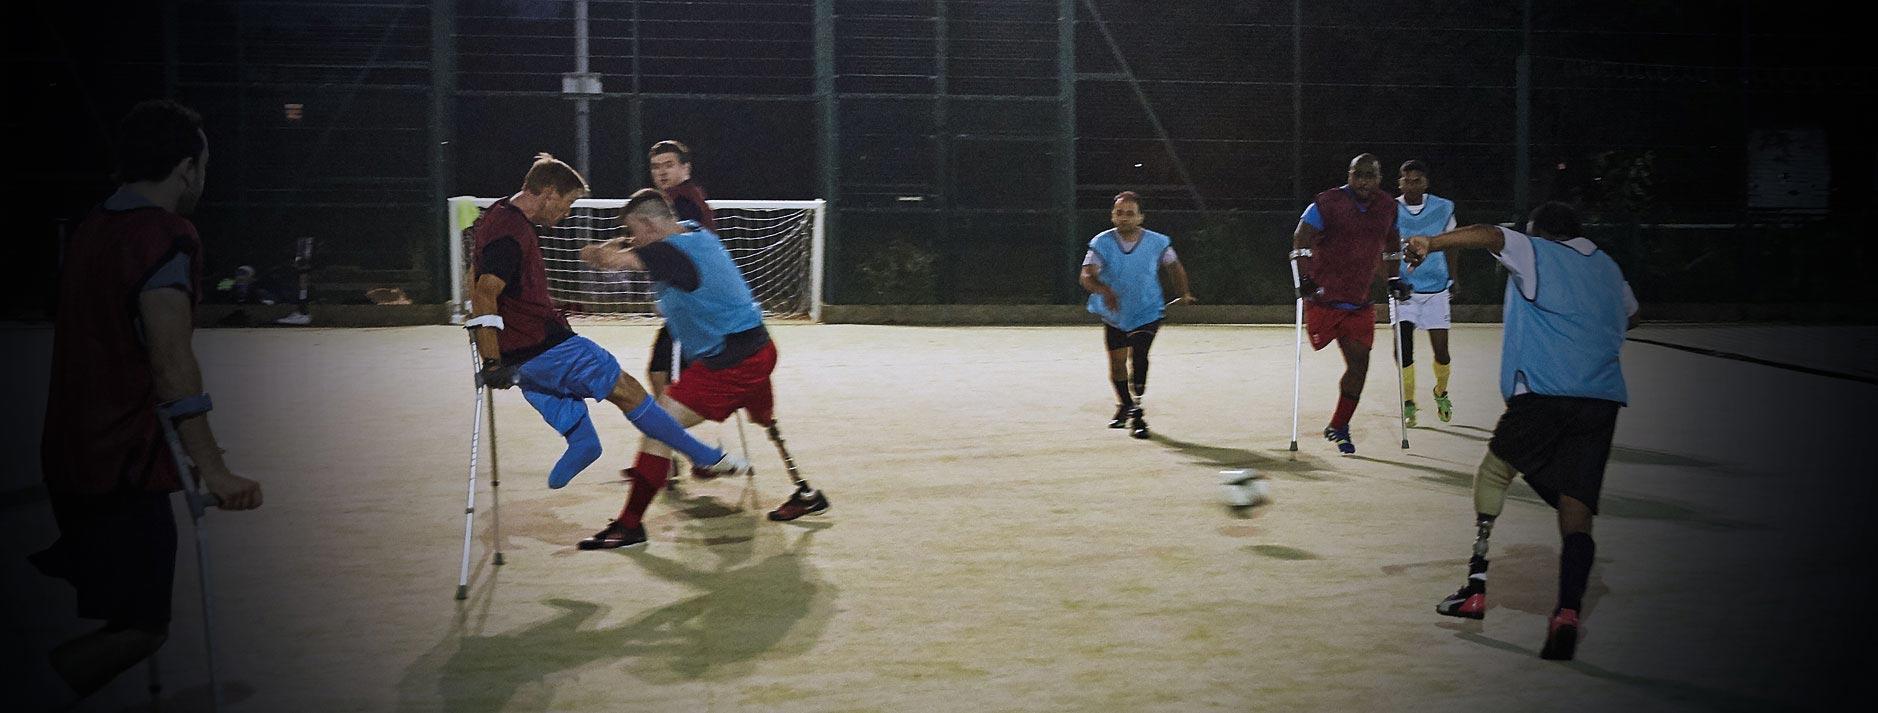 Ray Westbrook playing amputee football